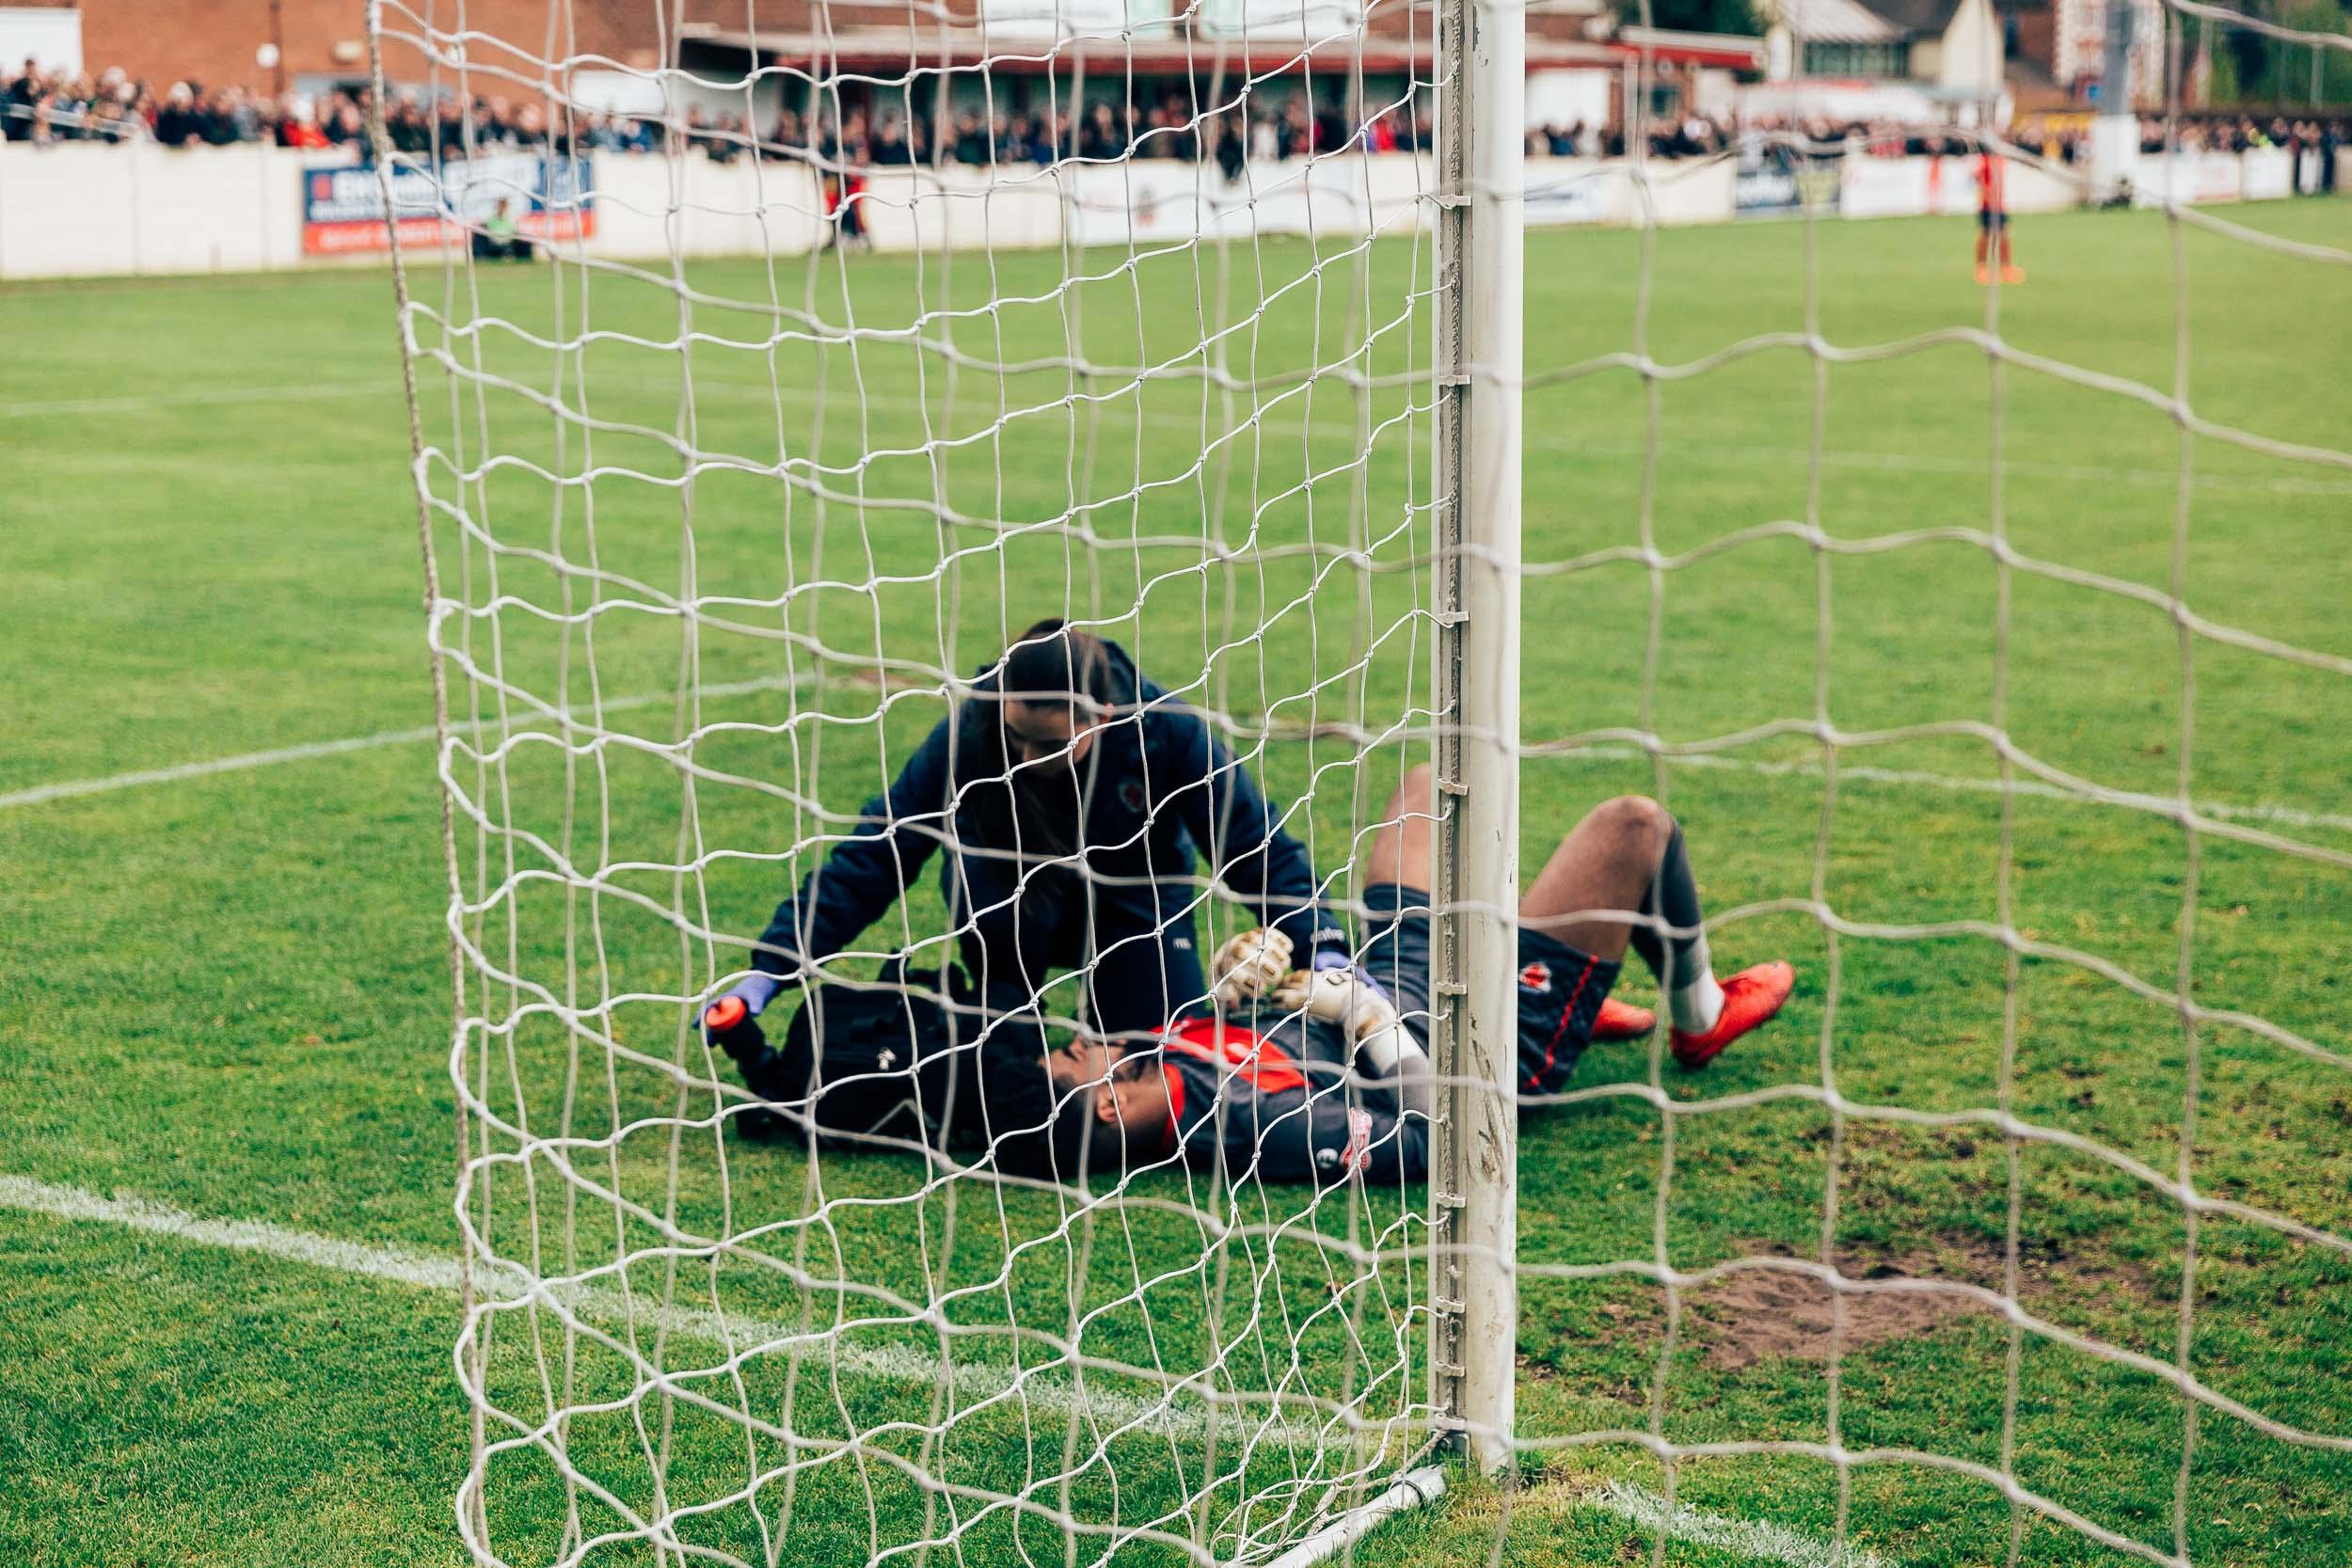 06_05_2019_Bromsgrove_Sporting_Corby-78.jpg